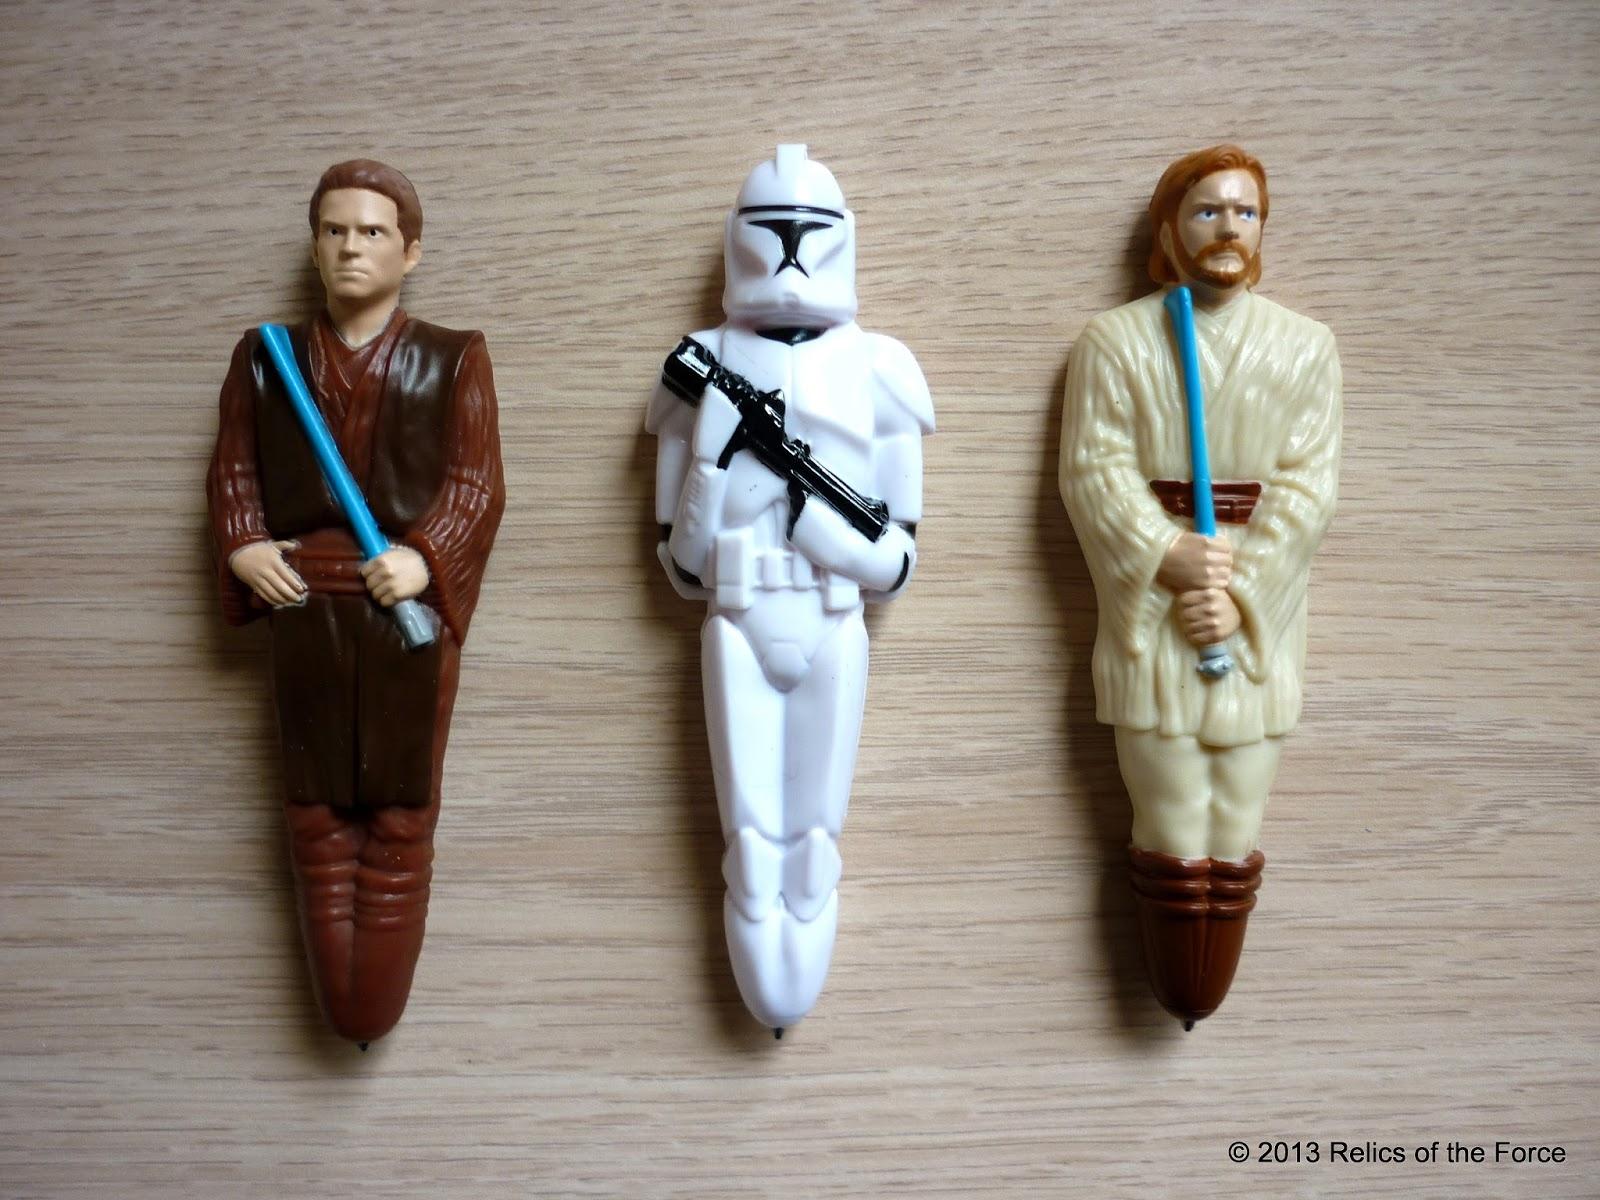 Relics Of The Force General Mills Cereal Star Wars Pens Anakin Skywalker Clone Trooper And Obi Wan Kenobi